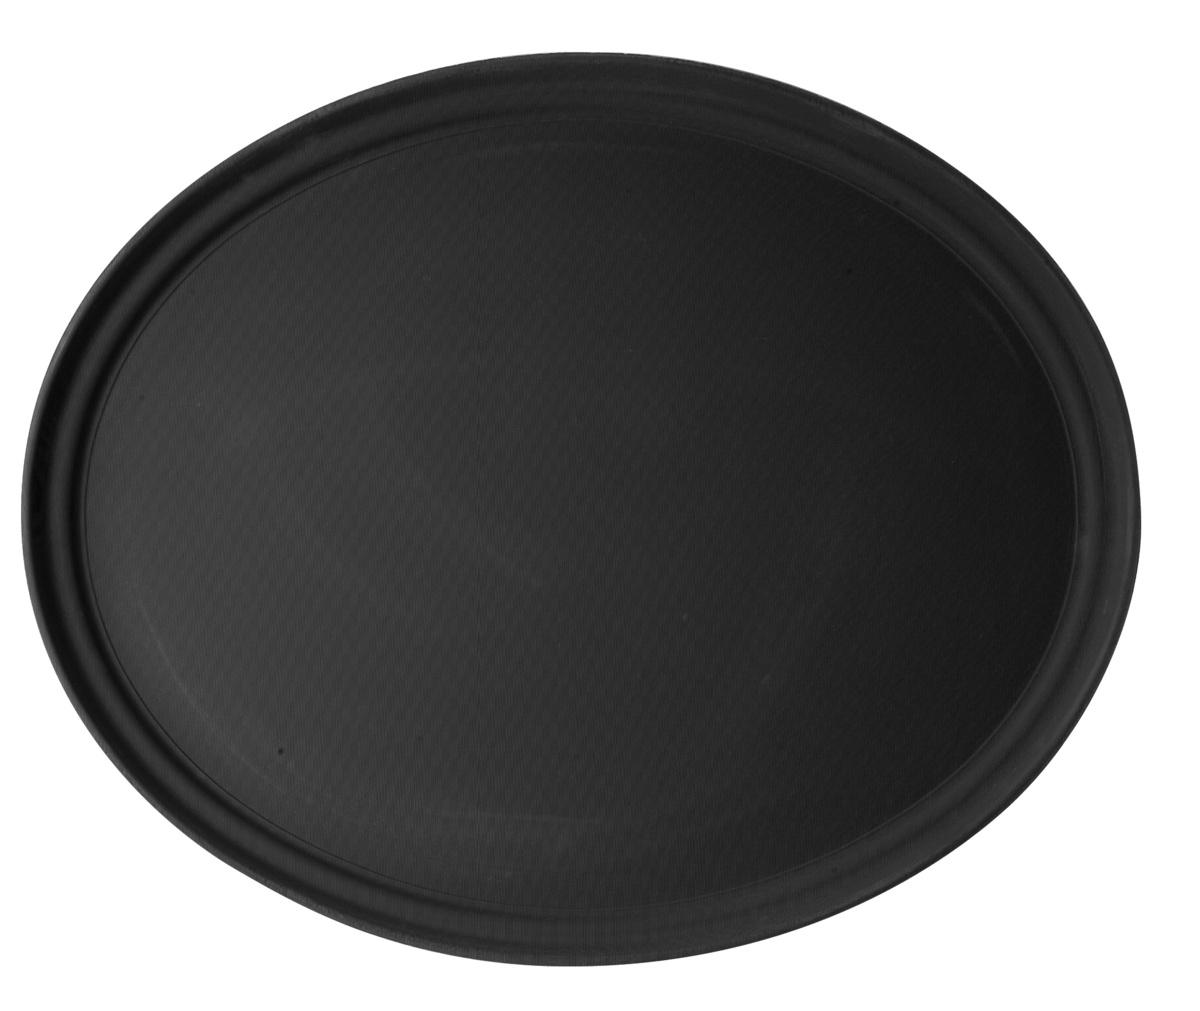 Plateau anti-dérapant ovale noir fibre de verre bord droit Camtread Cambro